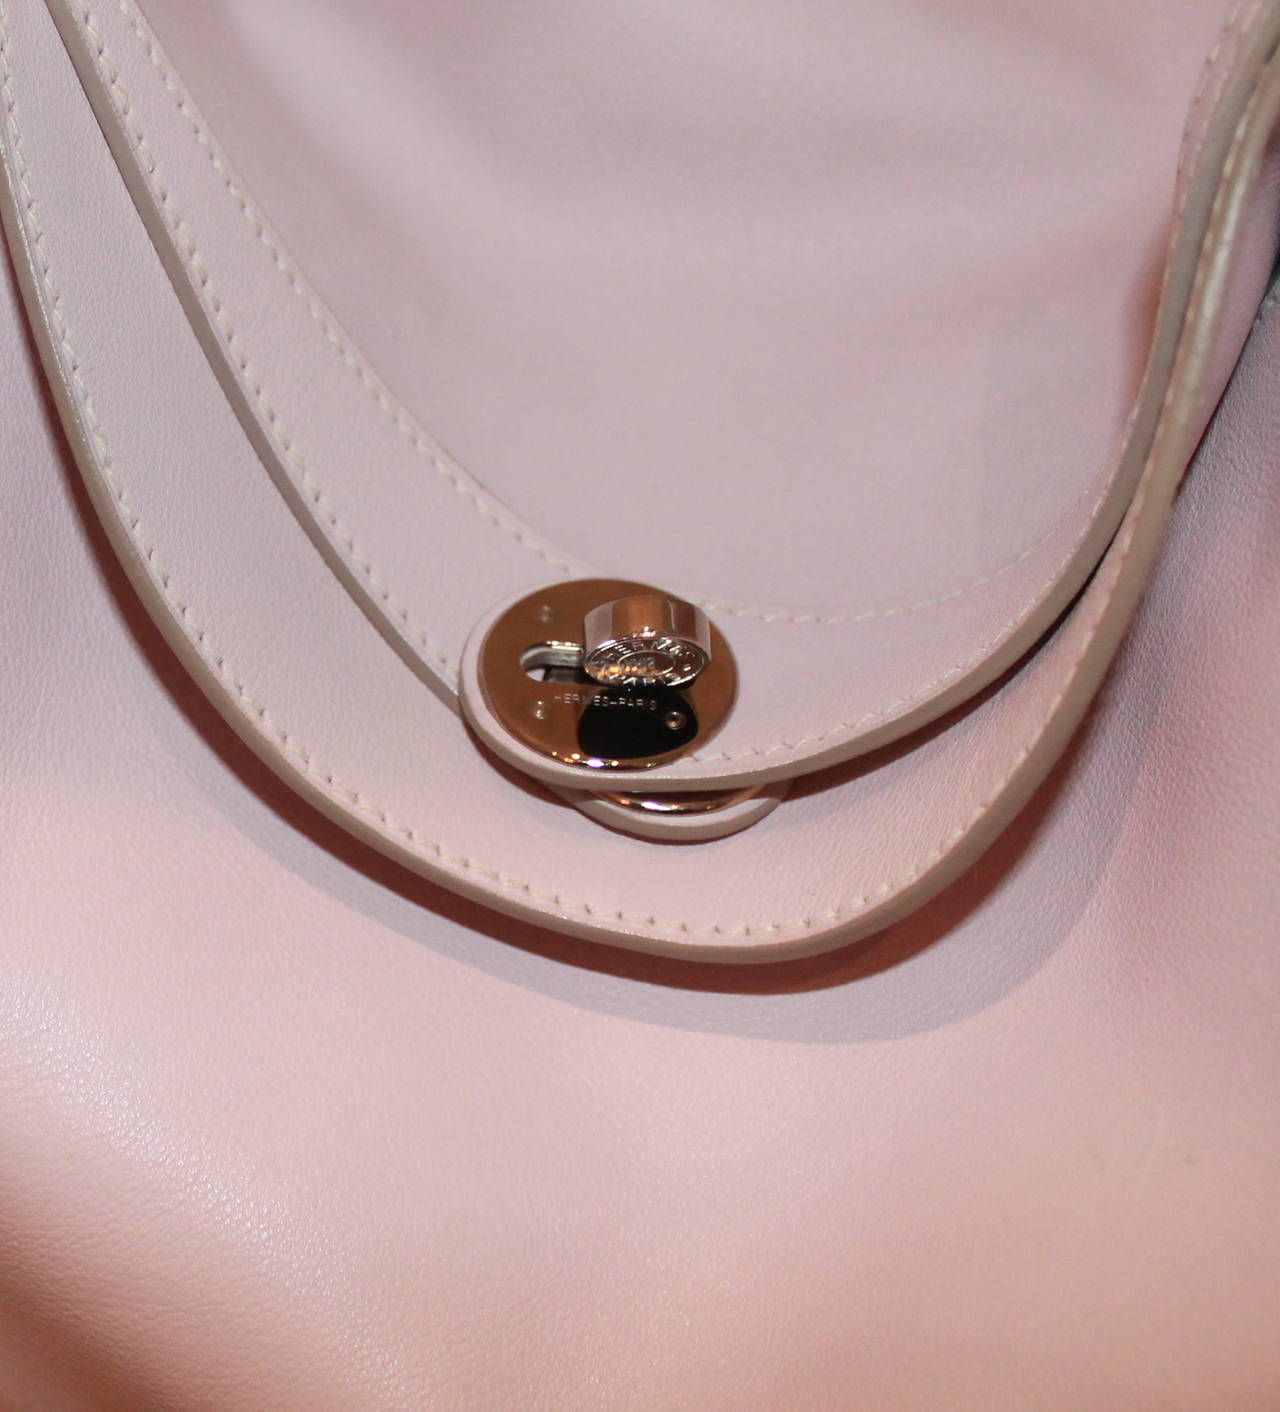 Gray Hermes Rose Dragee 30cm Lindy Veau Swift Handbag - circa 2007 For Sale